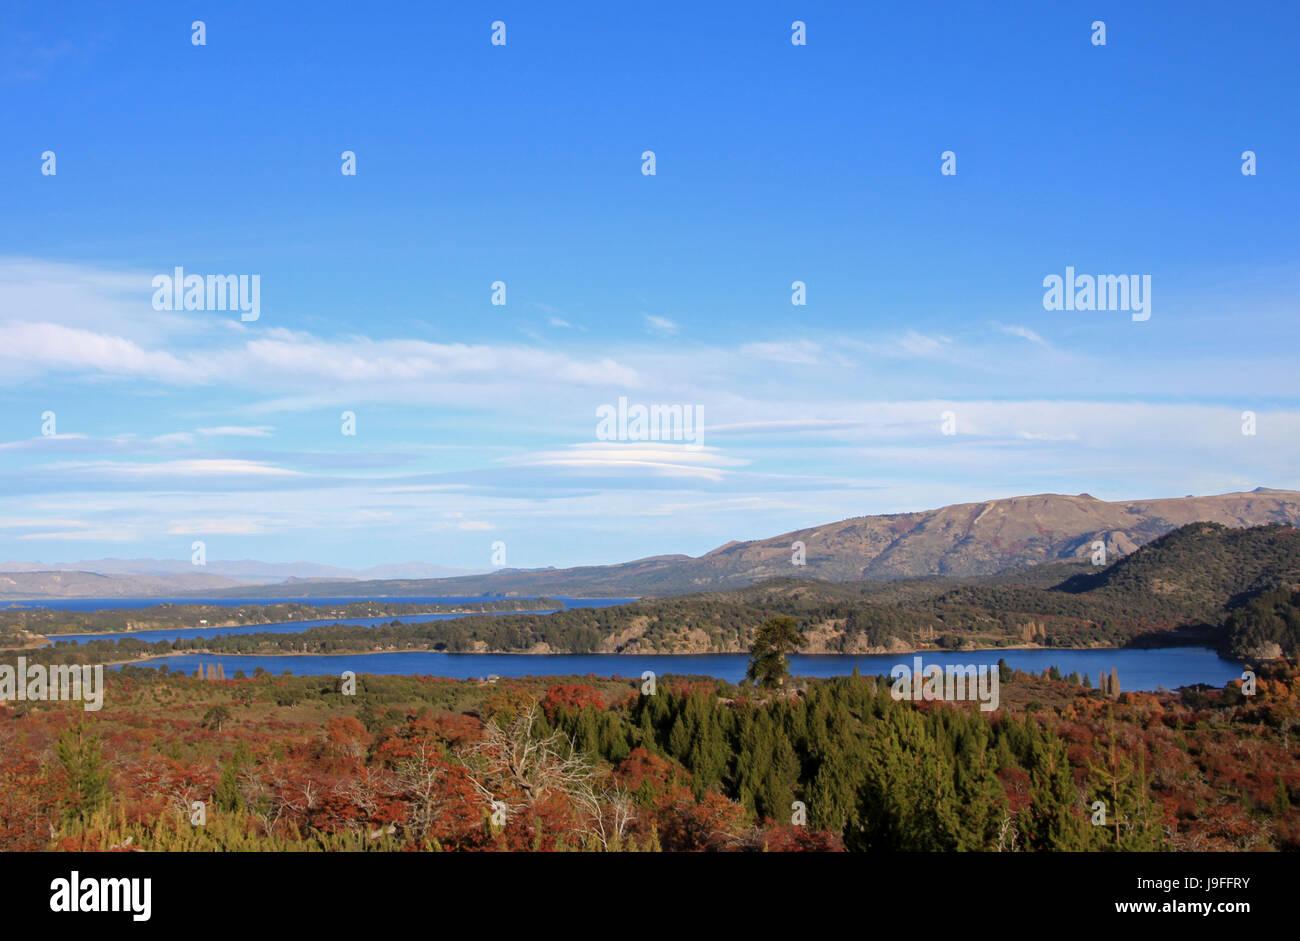 Alumine Lake, autumn colors, Patagonia Neuquen Argentina - Stock Image